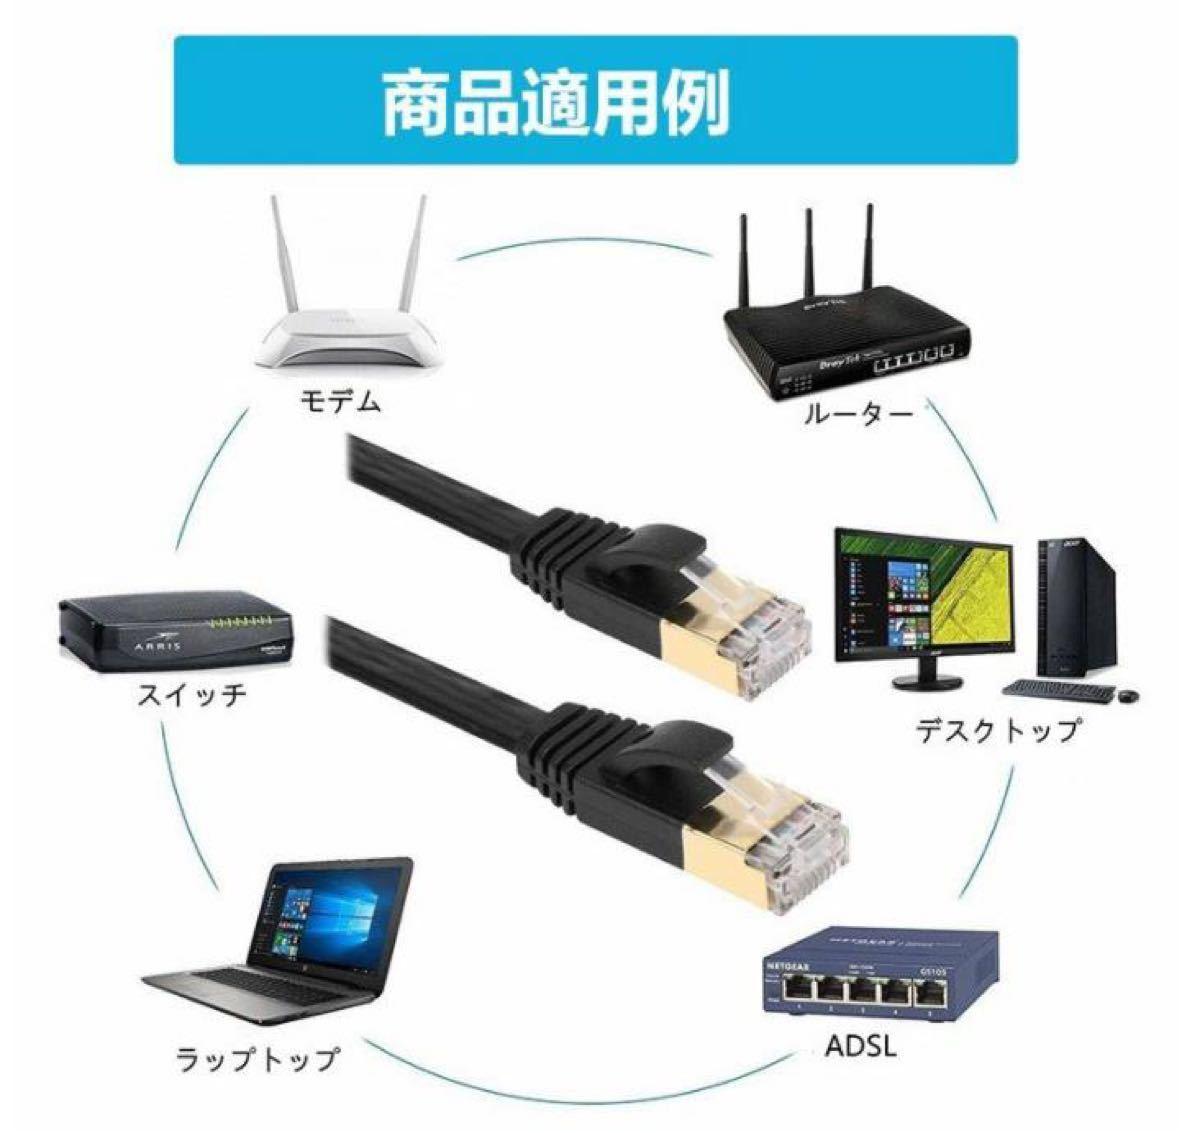 LANケーブル CAT8 10m RJ45 40ギガビット 高速光通信対応